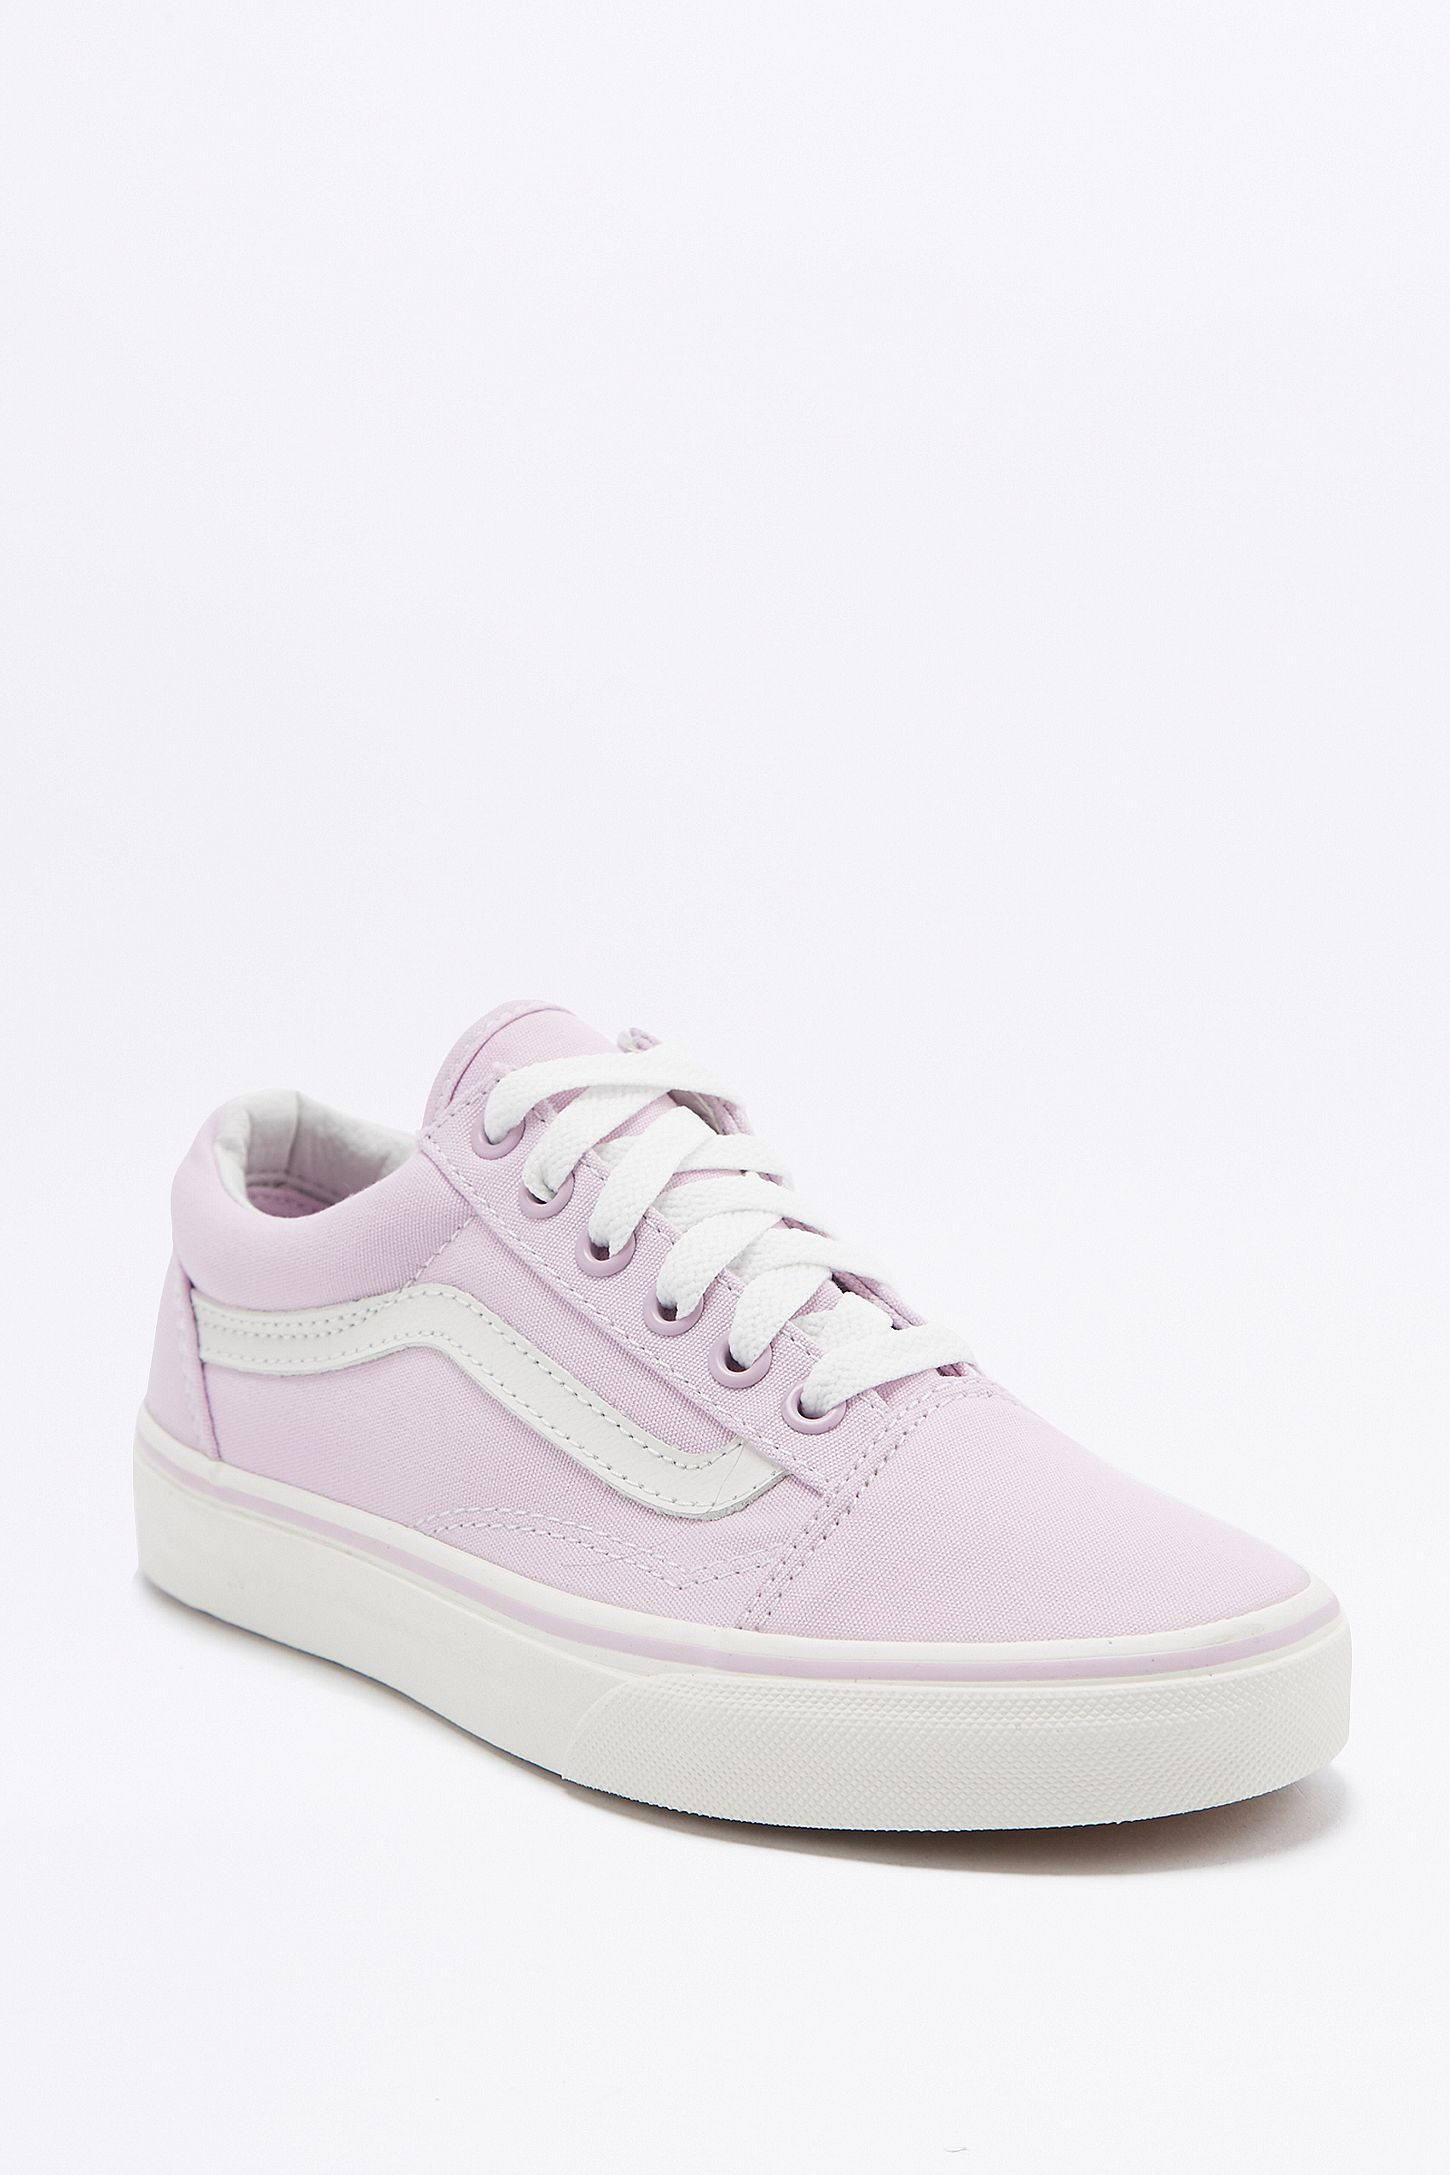 e32ba35868 Vans Old Skool Baby Pink Trainers